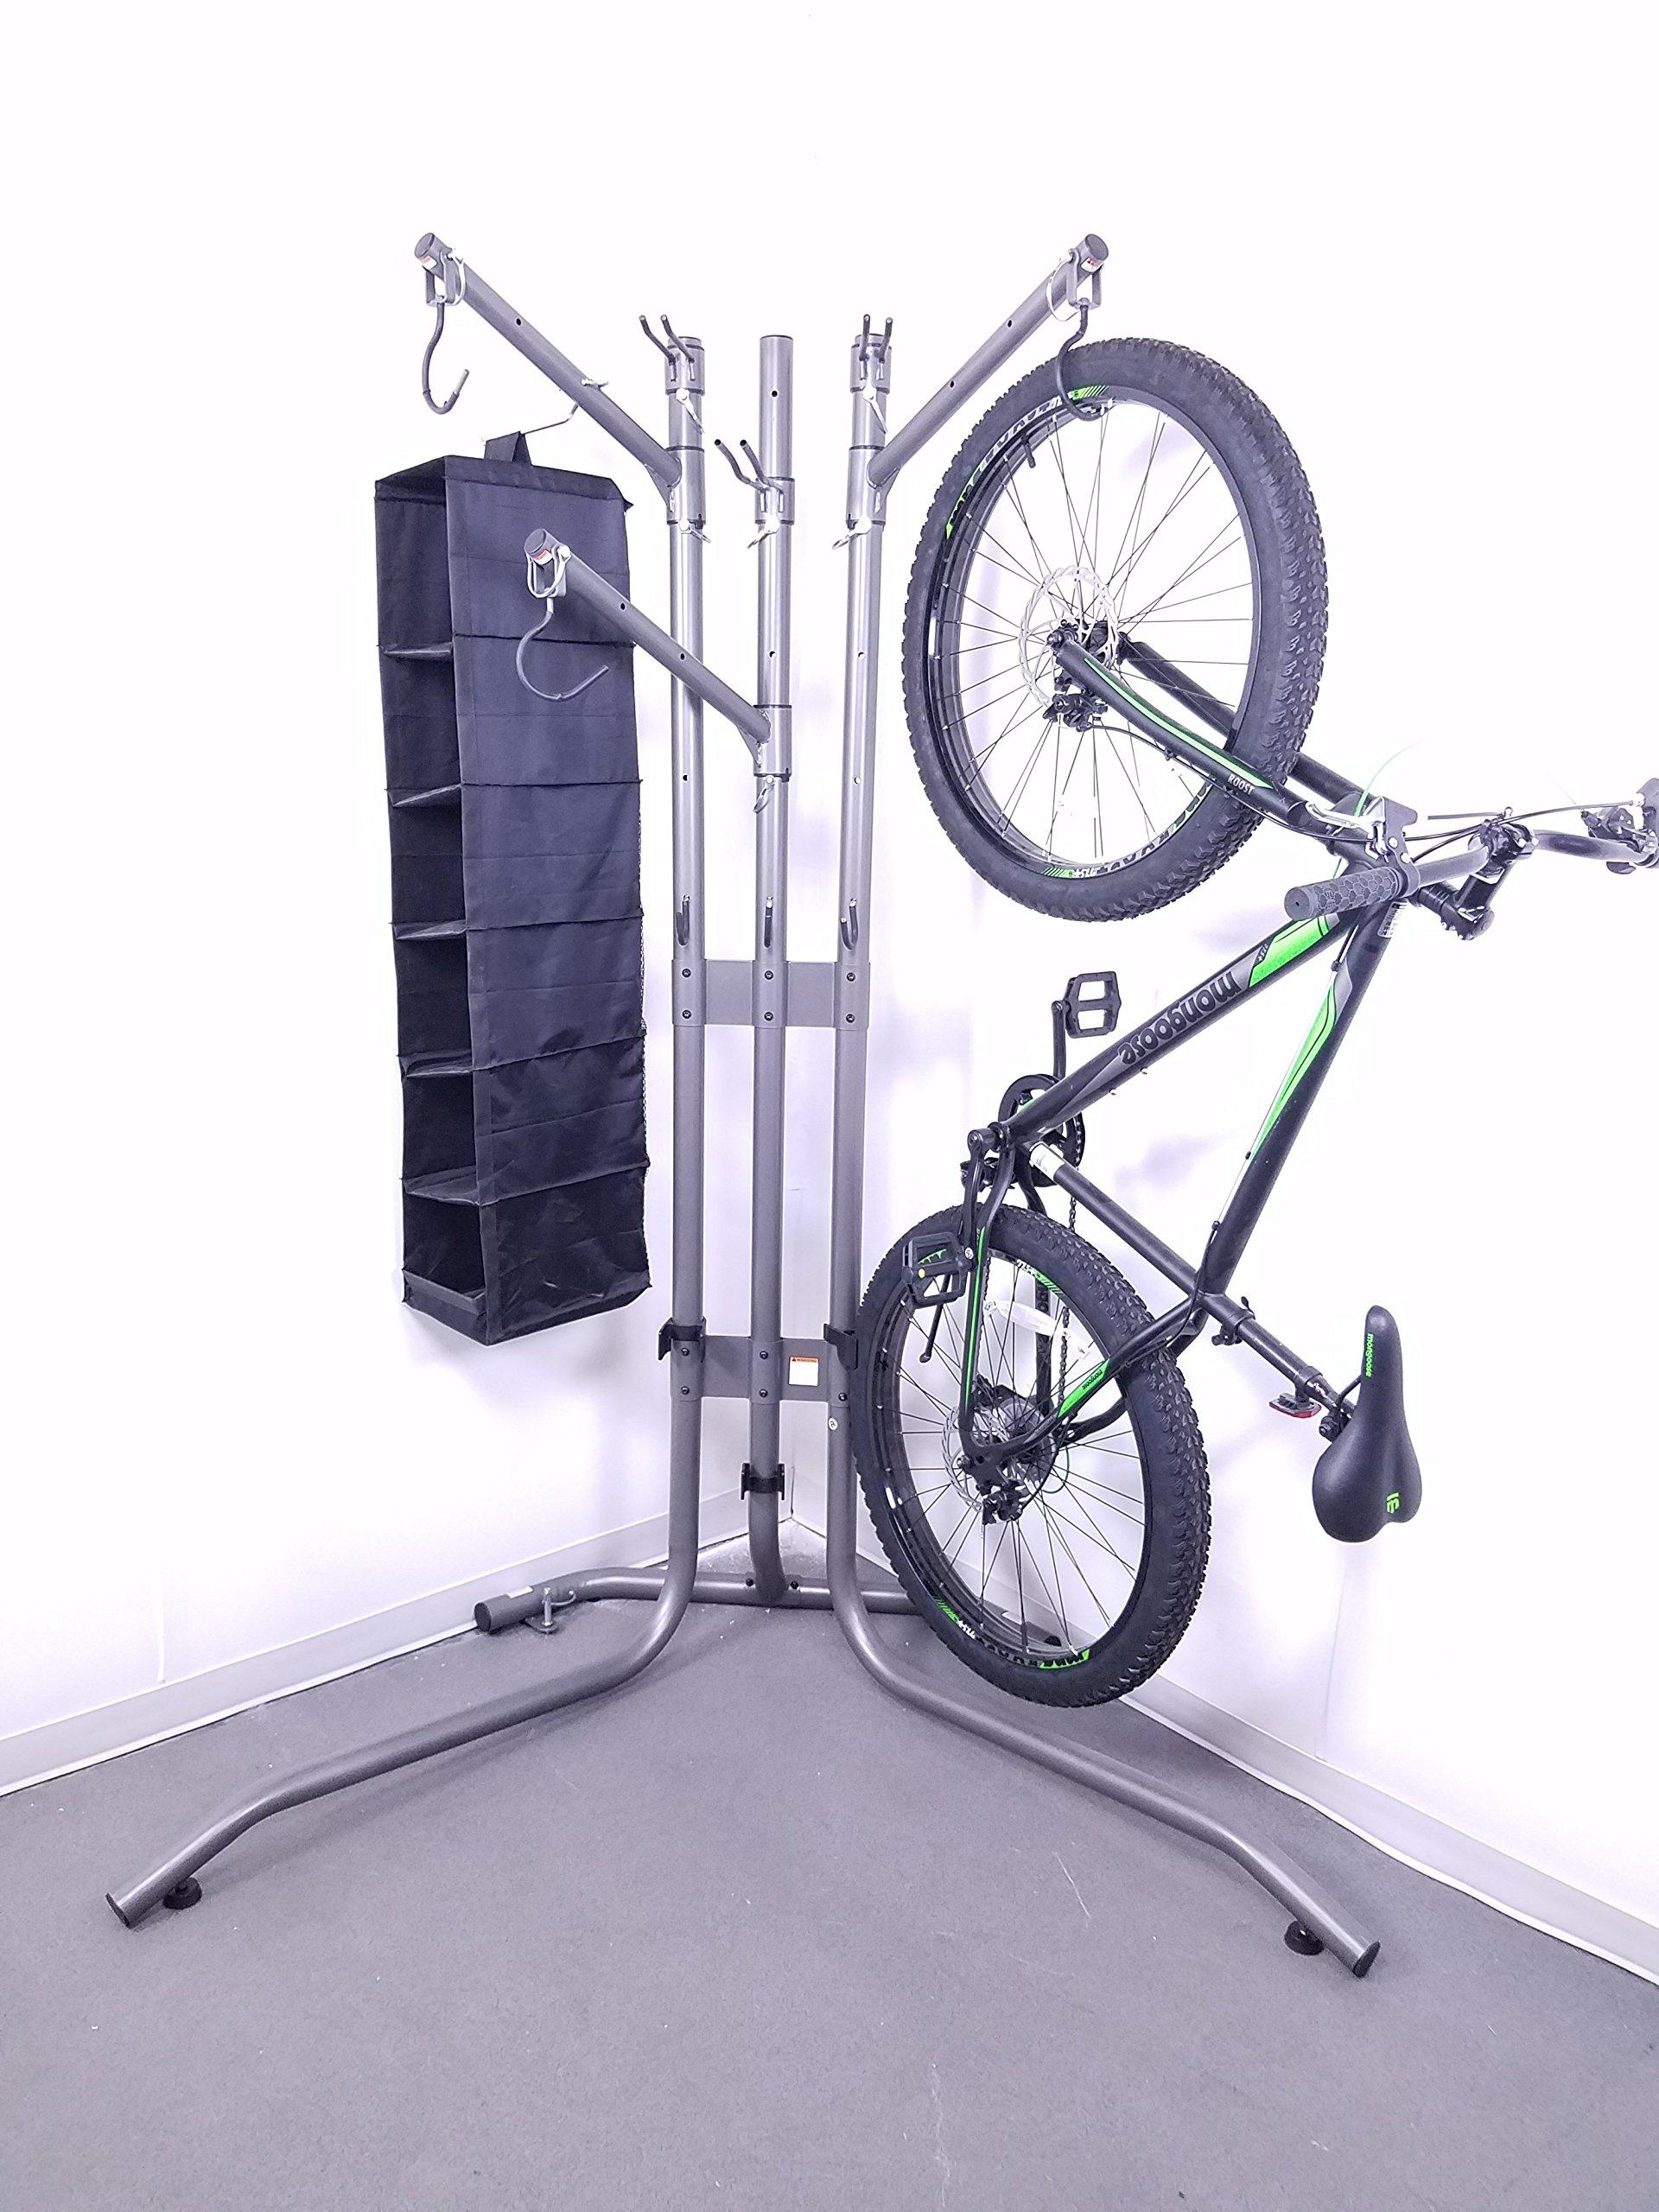 Rec-Rack   Super-Duty Garage Storage Rack for Multiple Bicycles, Skis, Skateboards, Helmets, More! by Rec-Rack